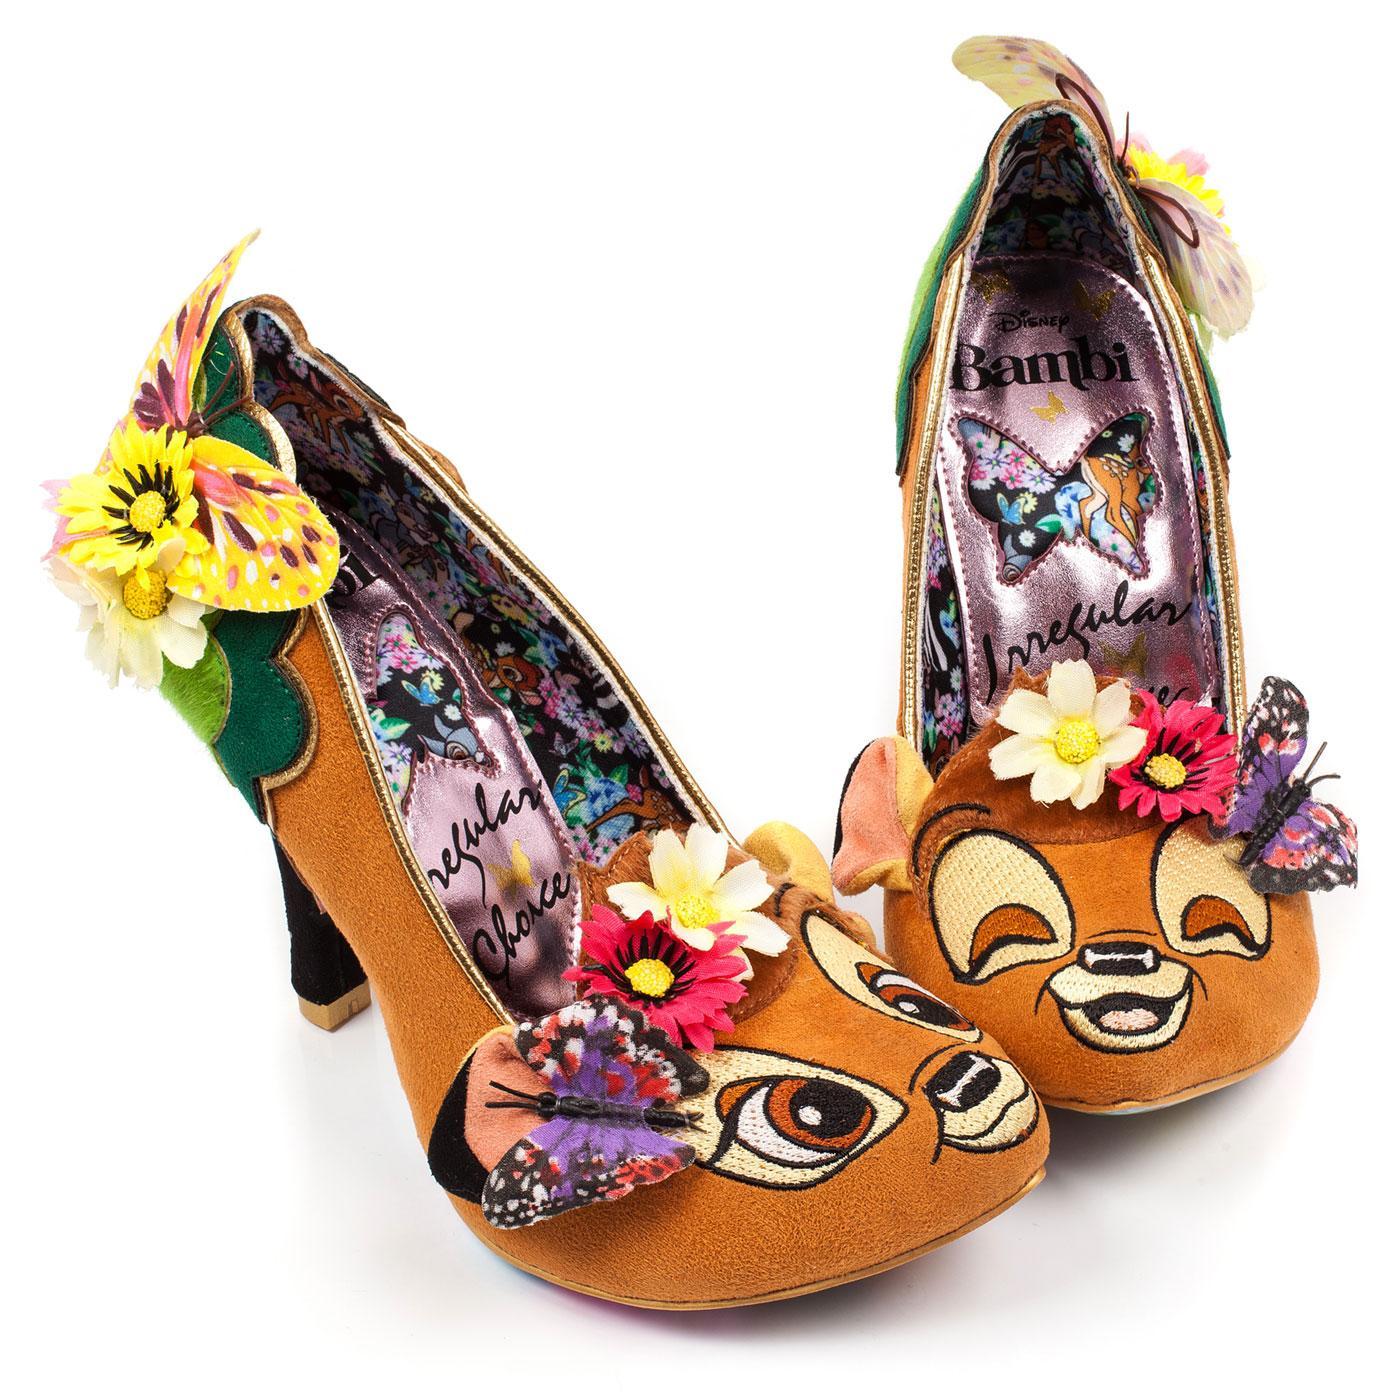 Hyah Bambi IRREGULAR CHOICE x DISNEYS BAMBI Shoes